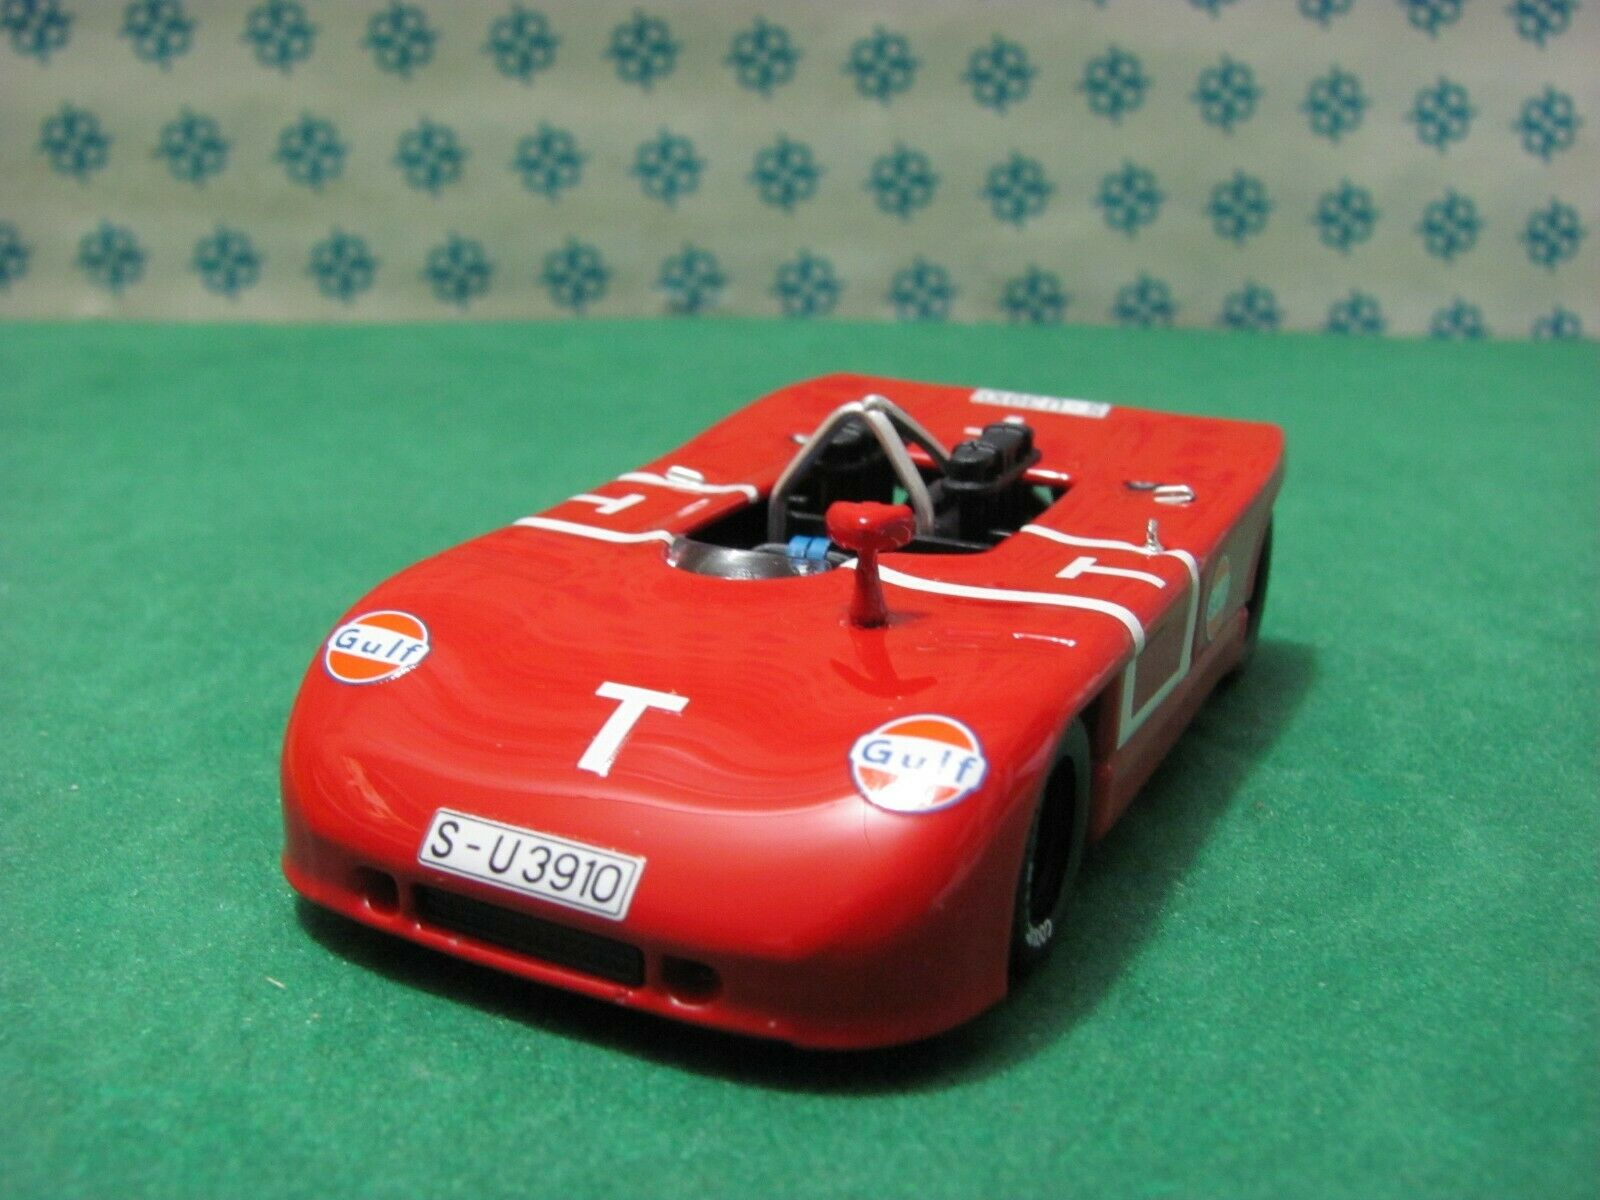 PORSCHE 908 3 3000cc. Spyder   Targa Florio prova 1970   - 1 43 Best 9415 L.E.